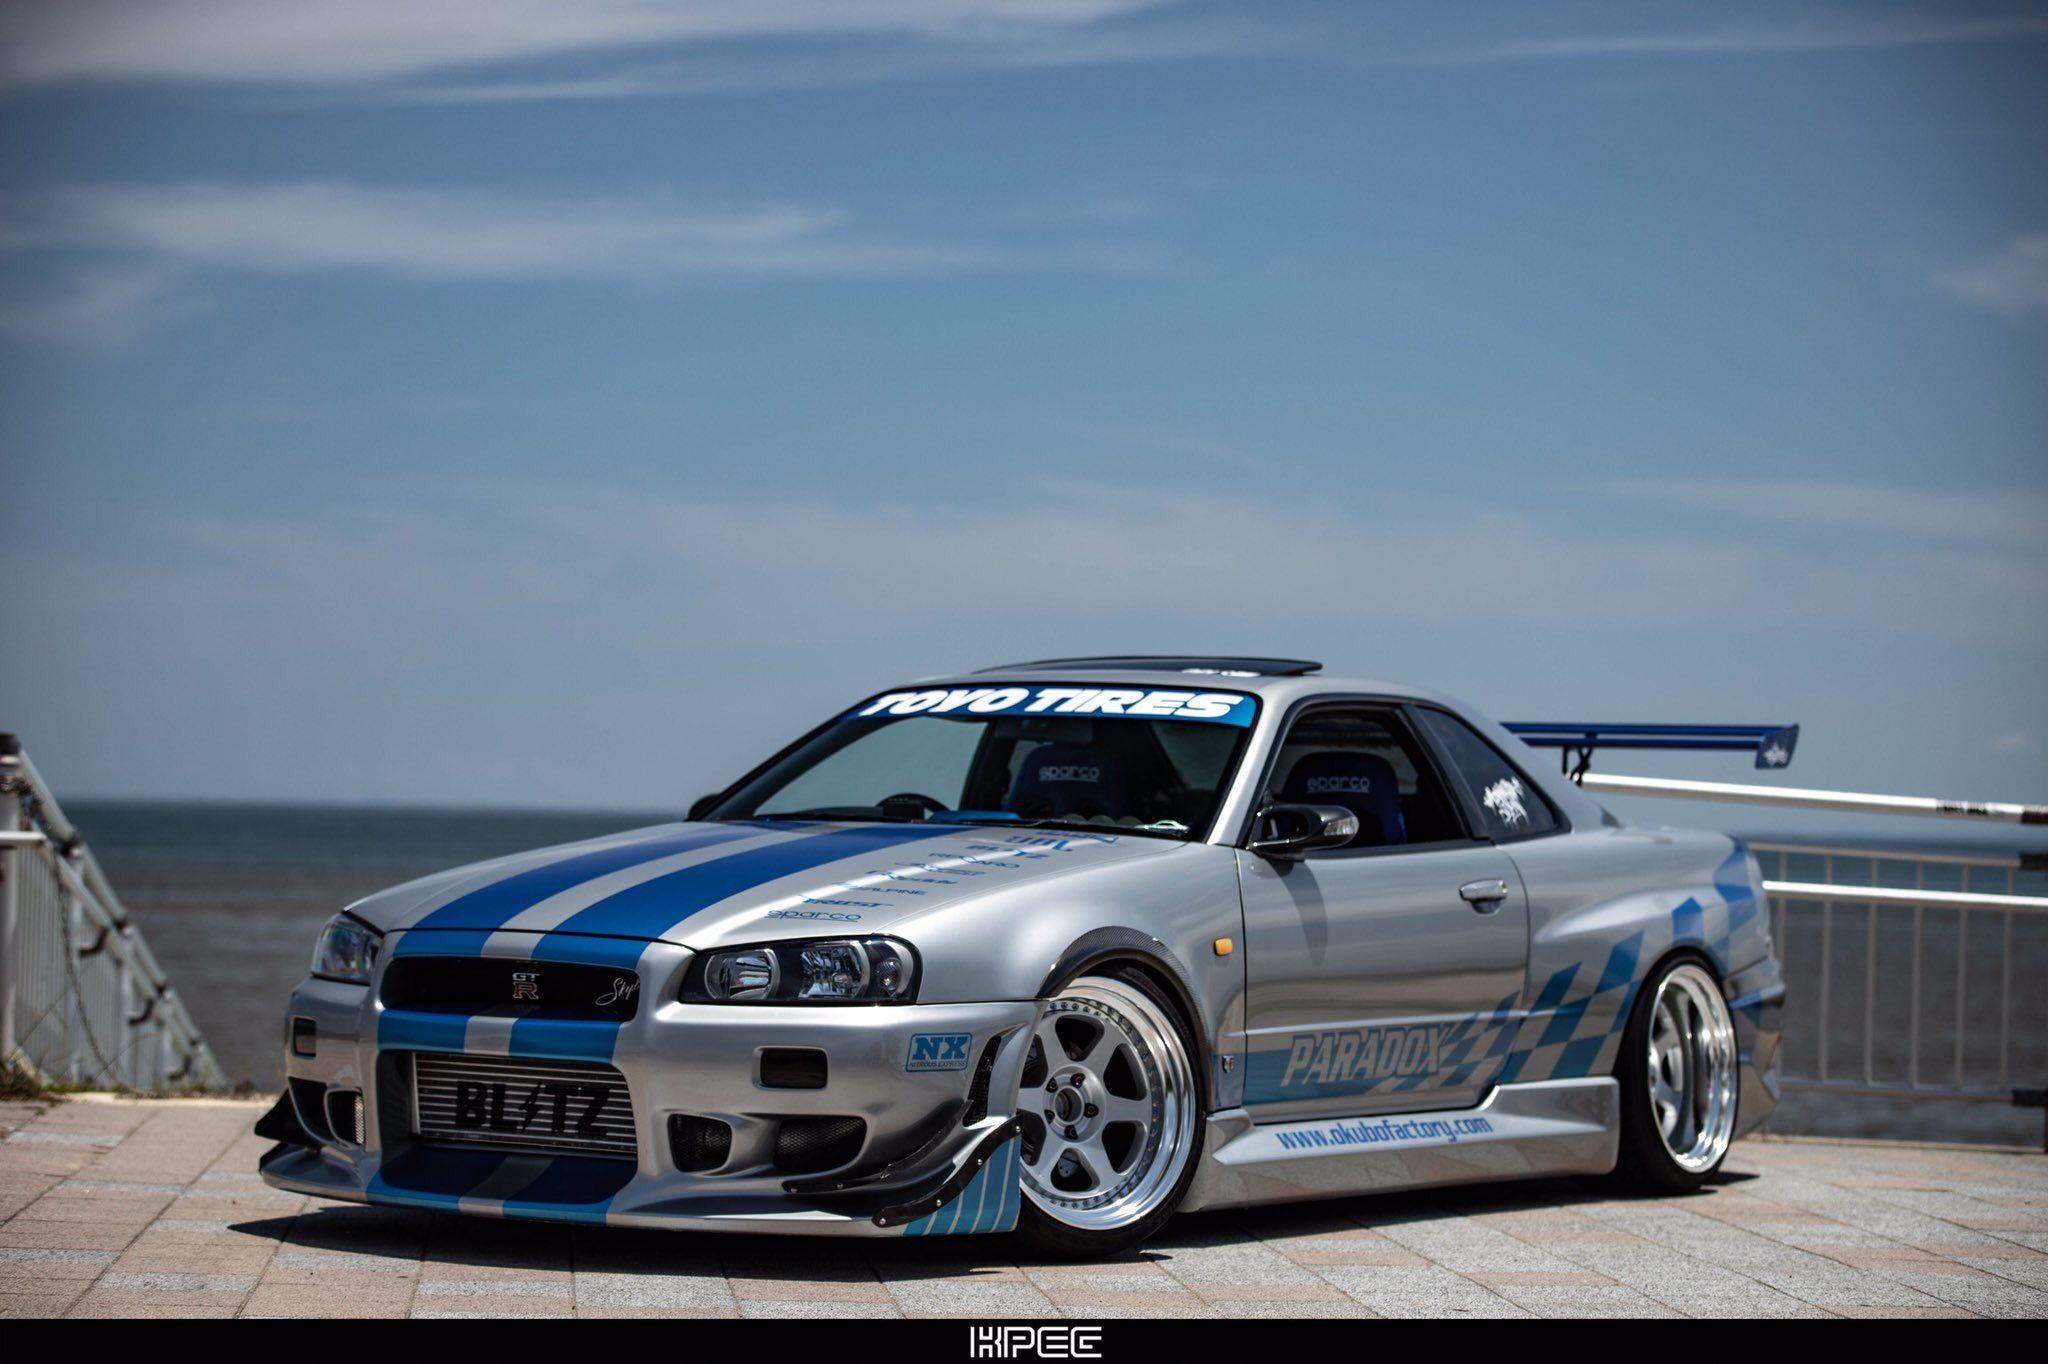 R34 Gtr Wallpaper With Images Nissan Skyline Nissan Cars Car